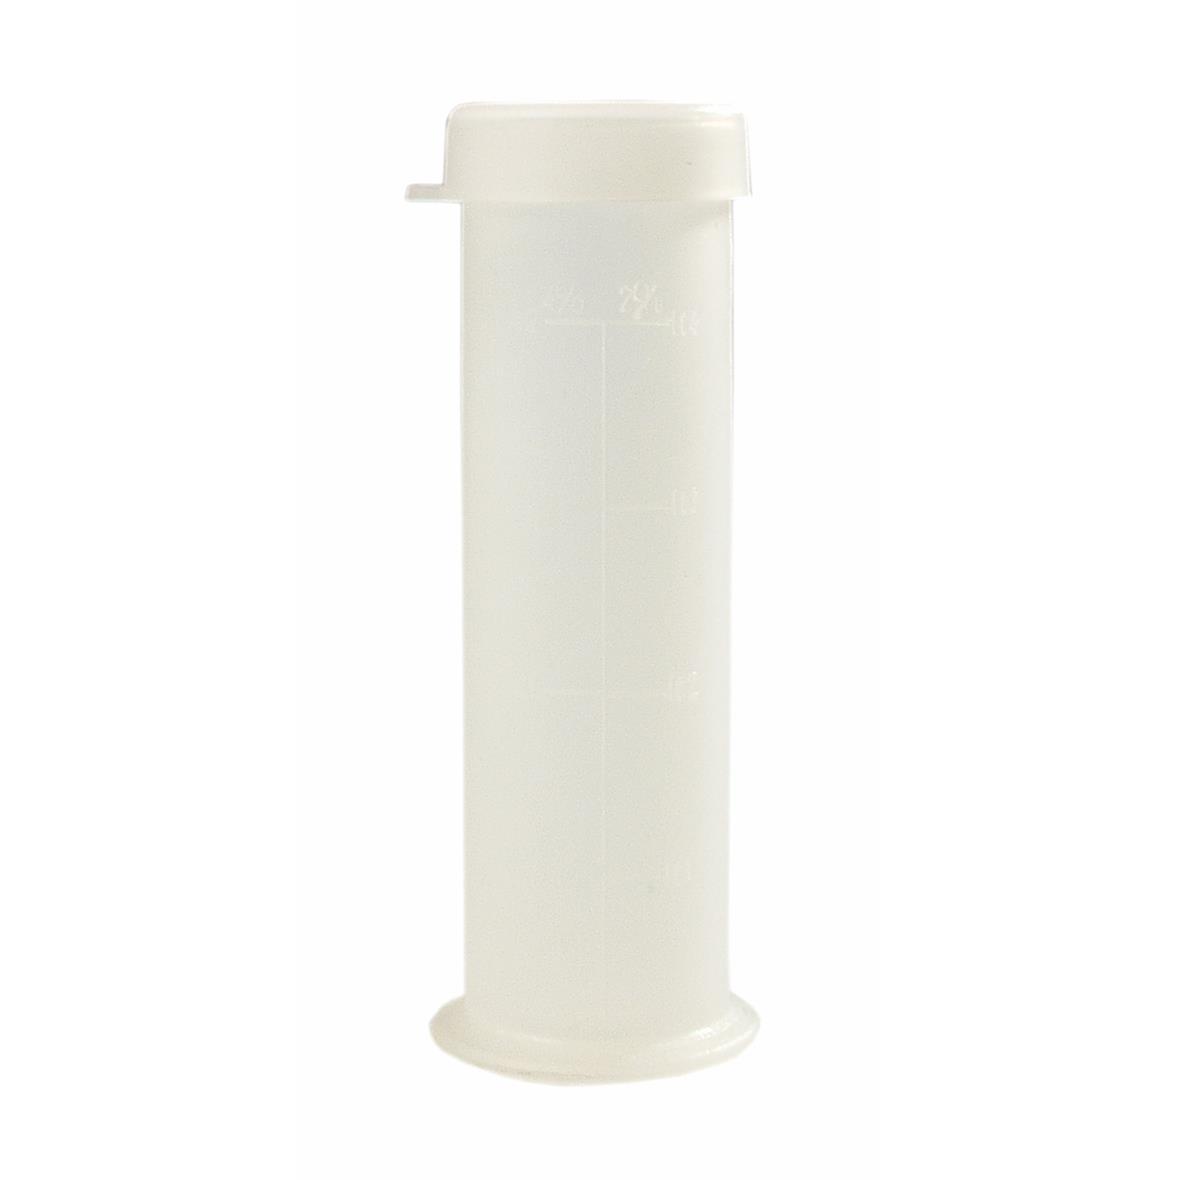 "Imagen del producto para 'Medidor liquidas POLINI ""UTAH""Title'"